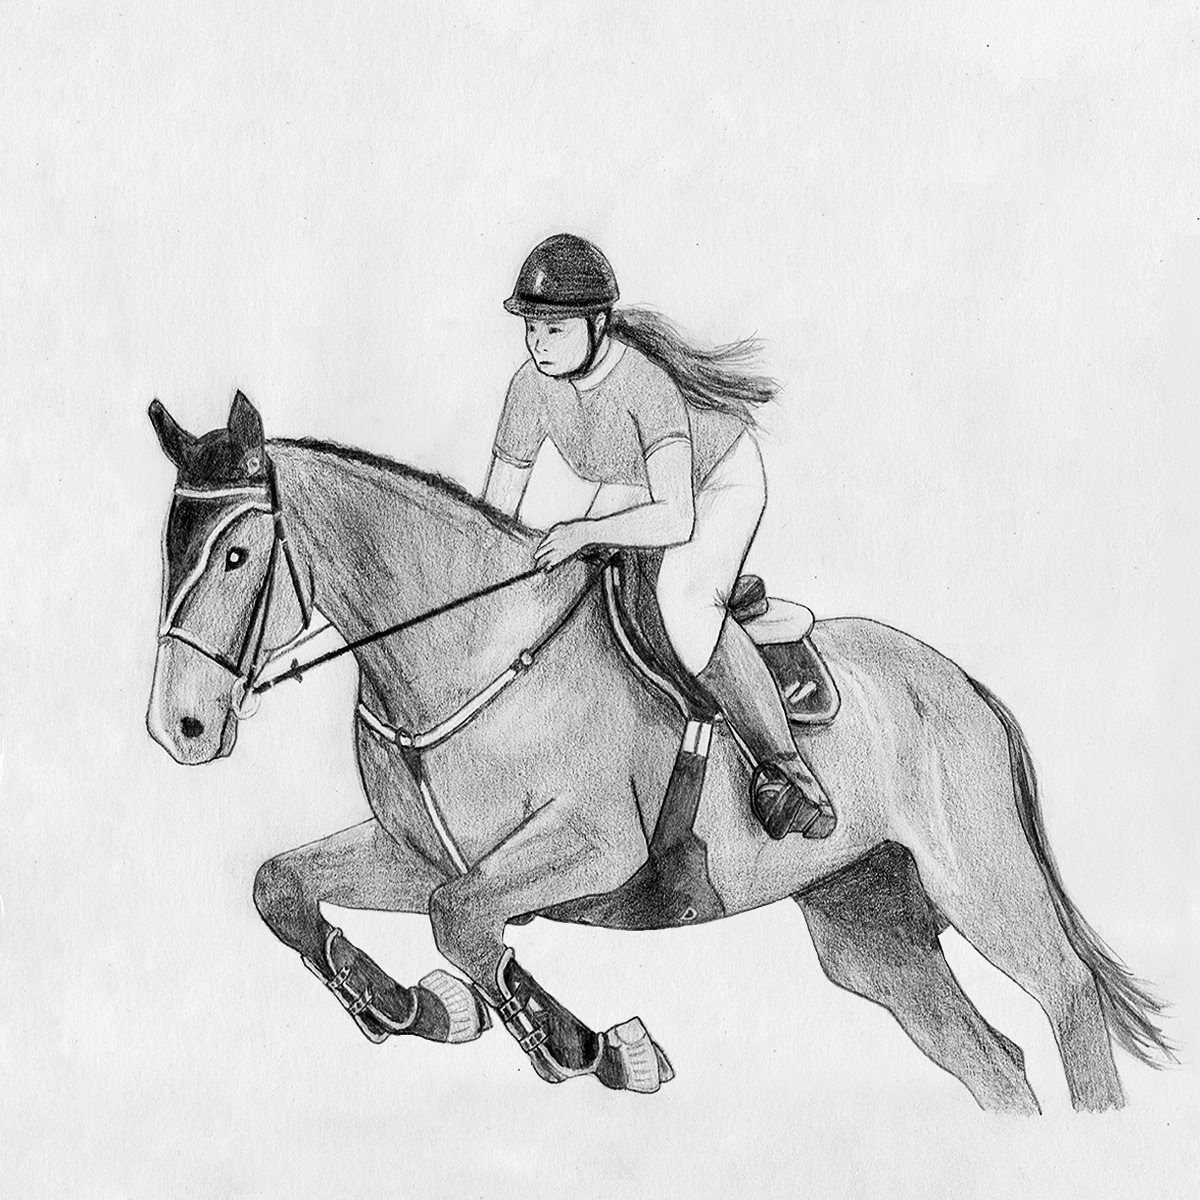 Sian Artwork On Twitter Horse Jumping Drawing For Today D Horsedrawing Horsejumping Jumpinghorse Horsejumpingdrawing Jumpinghorsedrawing Https T Co Q63yjjsajw